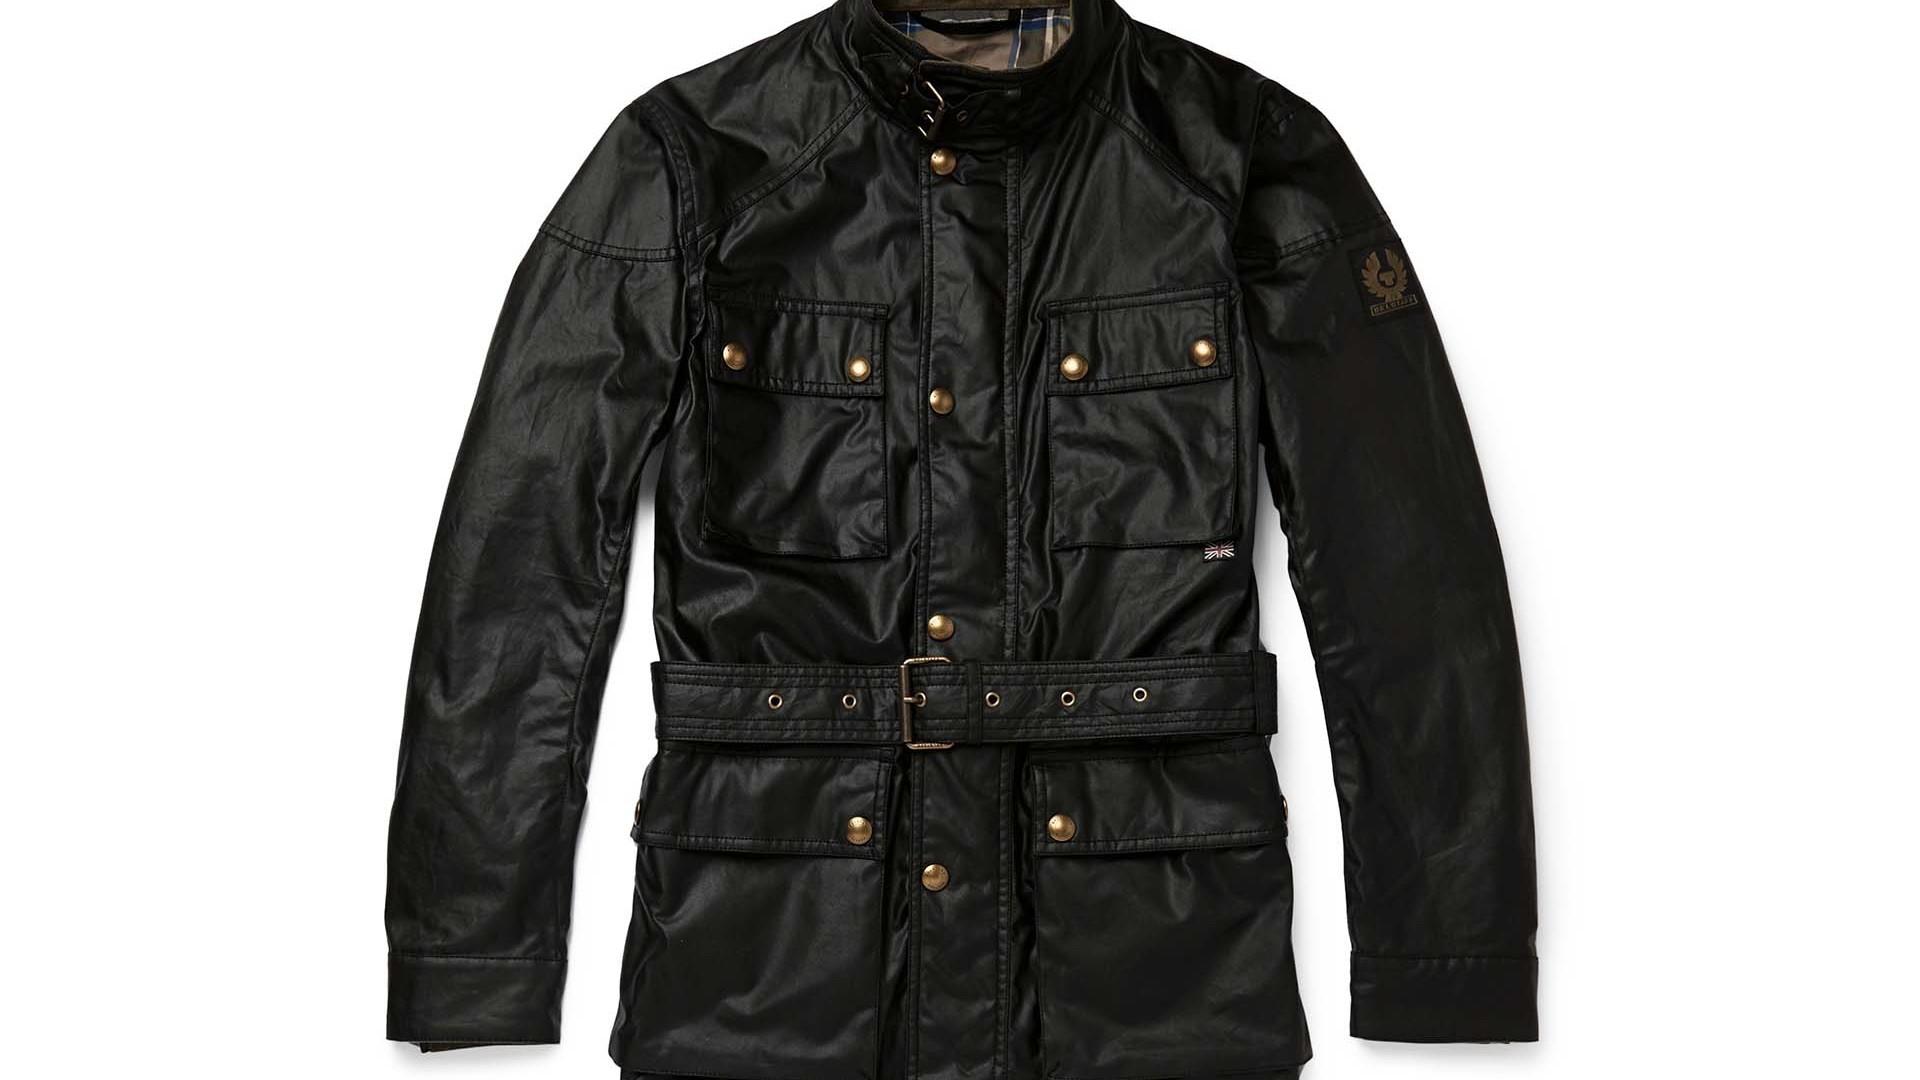 The Motorcycle Jacket: Belstaff Roadmaster Jacket